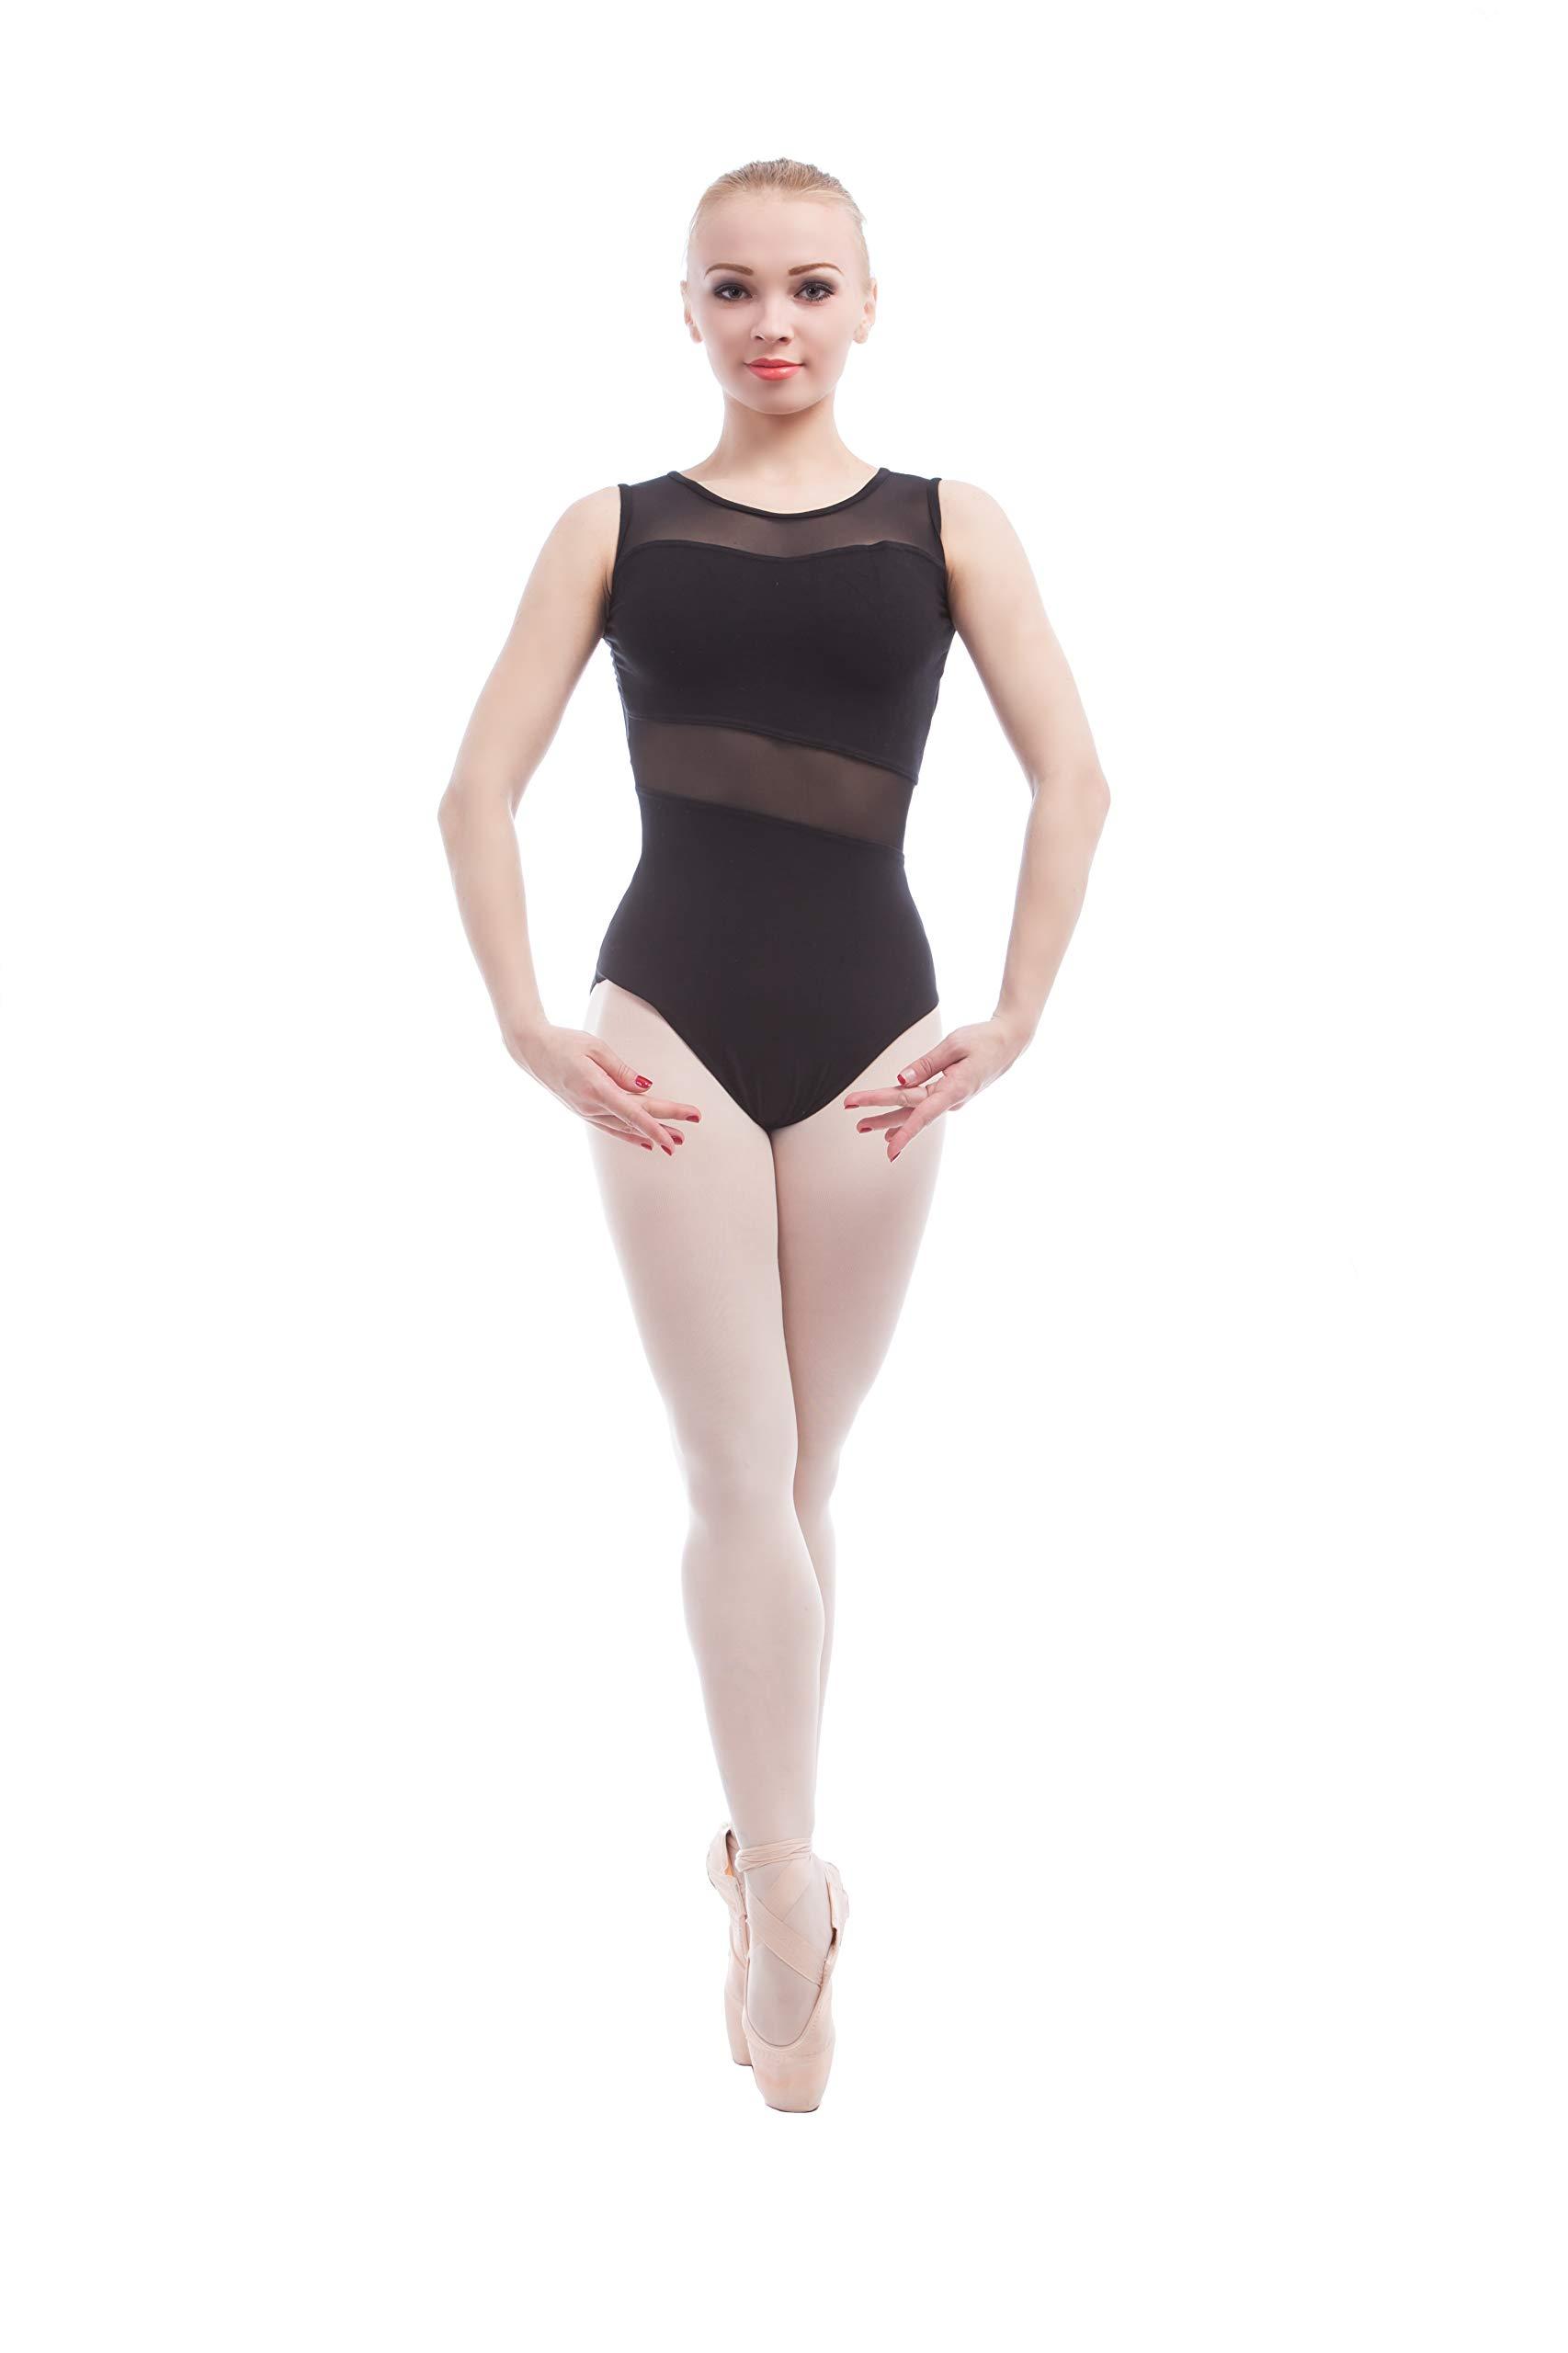 Dance Favourite Girls and Womens Gymnastics Camisole Leotards For Ballet AM01056